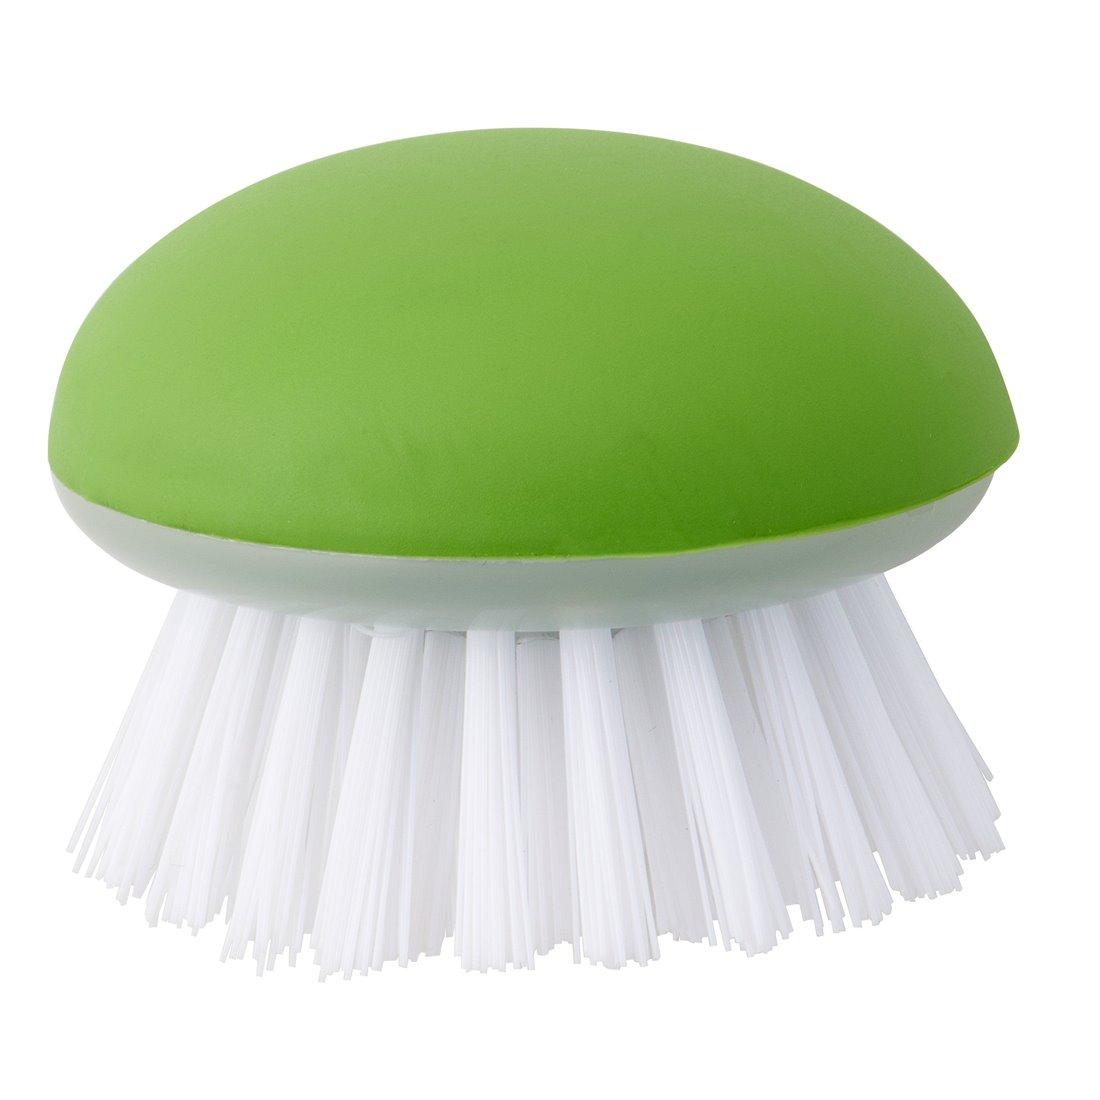 Tefal K2080214 Fresh Kitchen Brosse Plastique Vert 5 x 6,4 x 6,4 cm